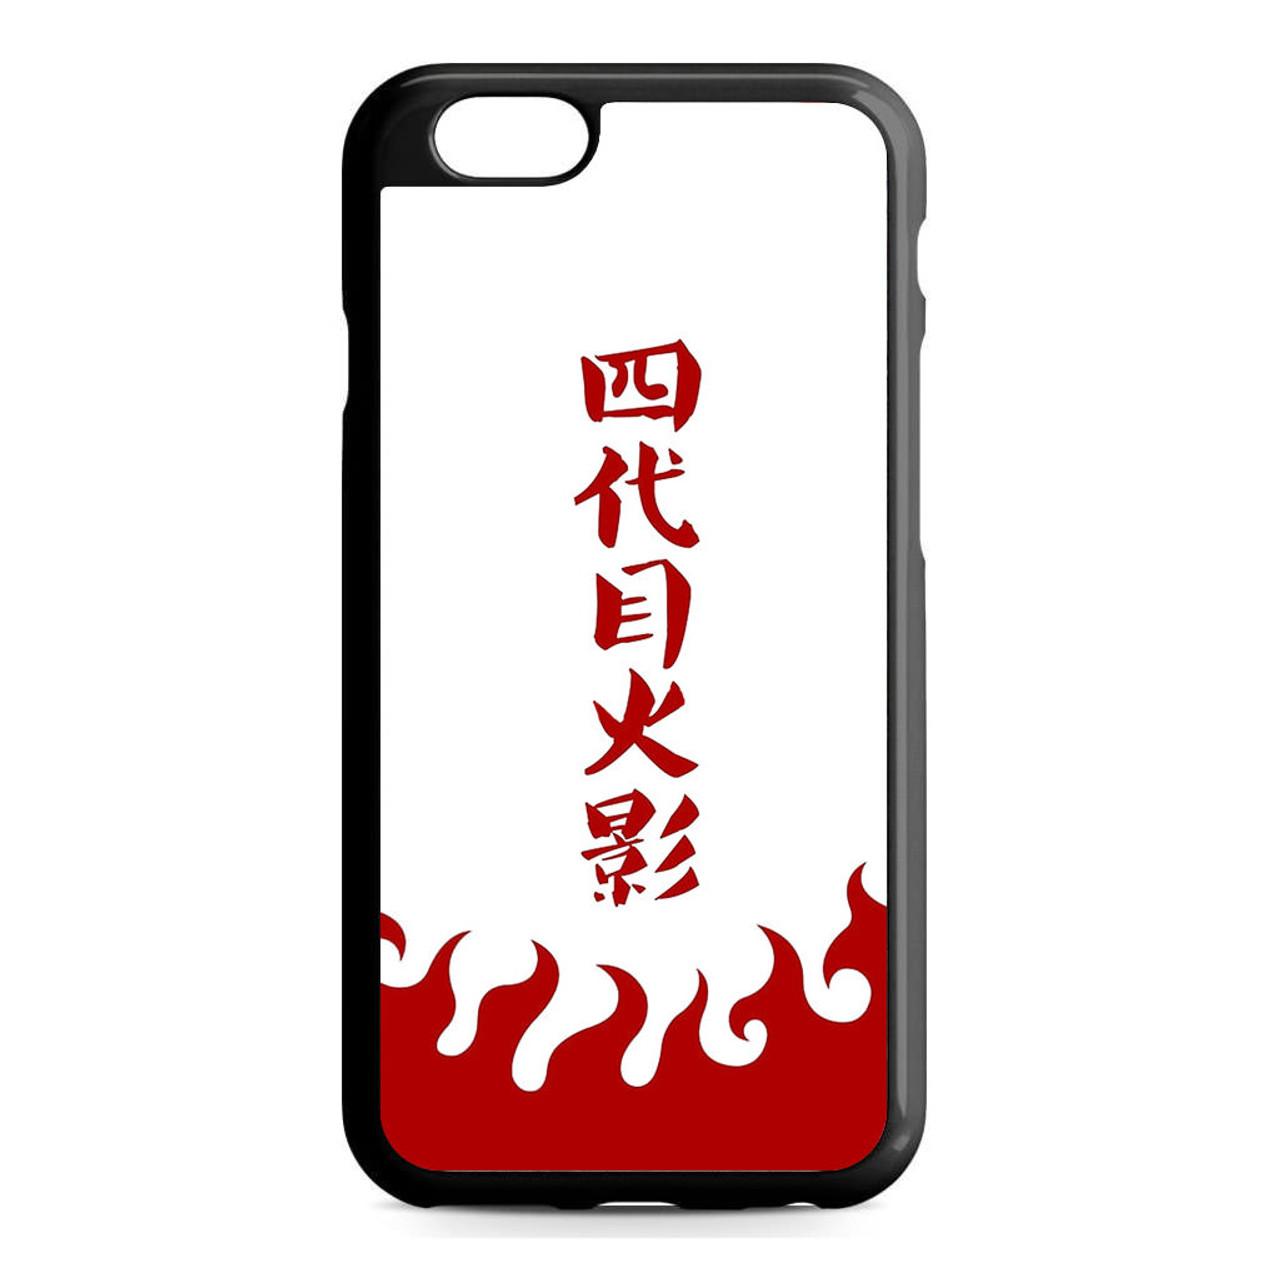 naruto iphone 6 case